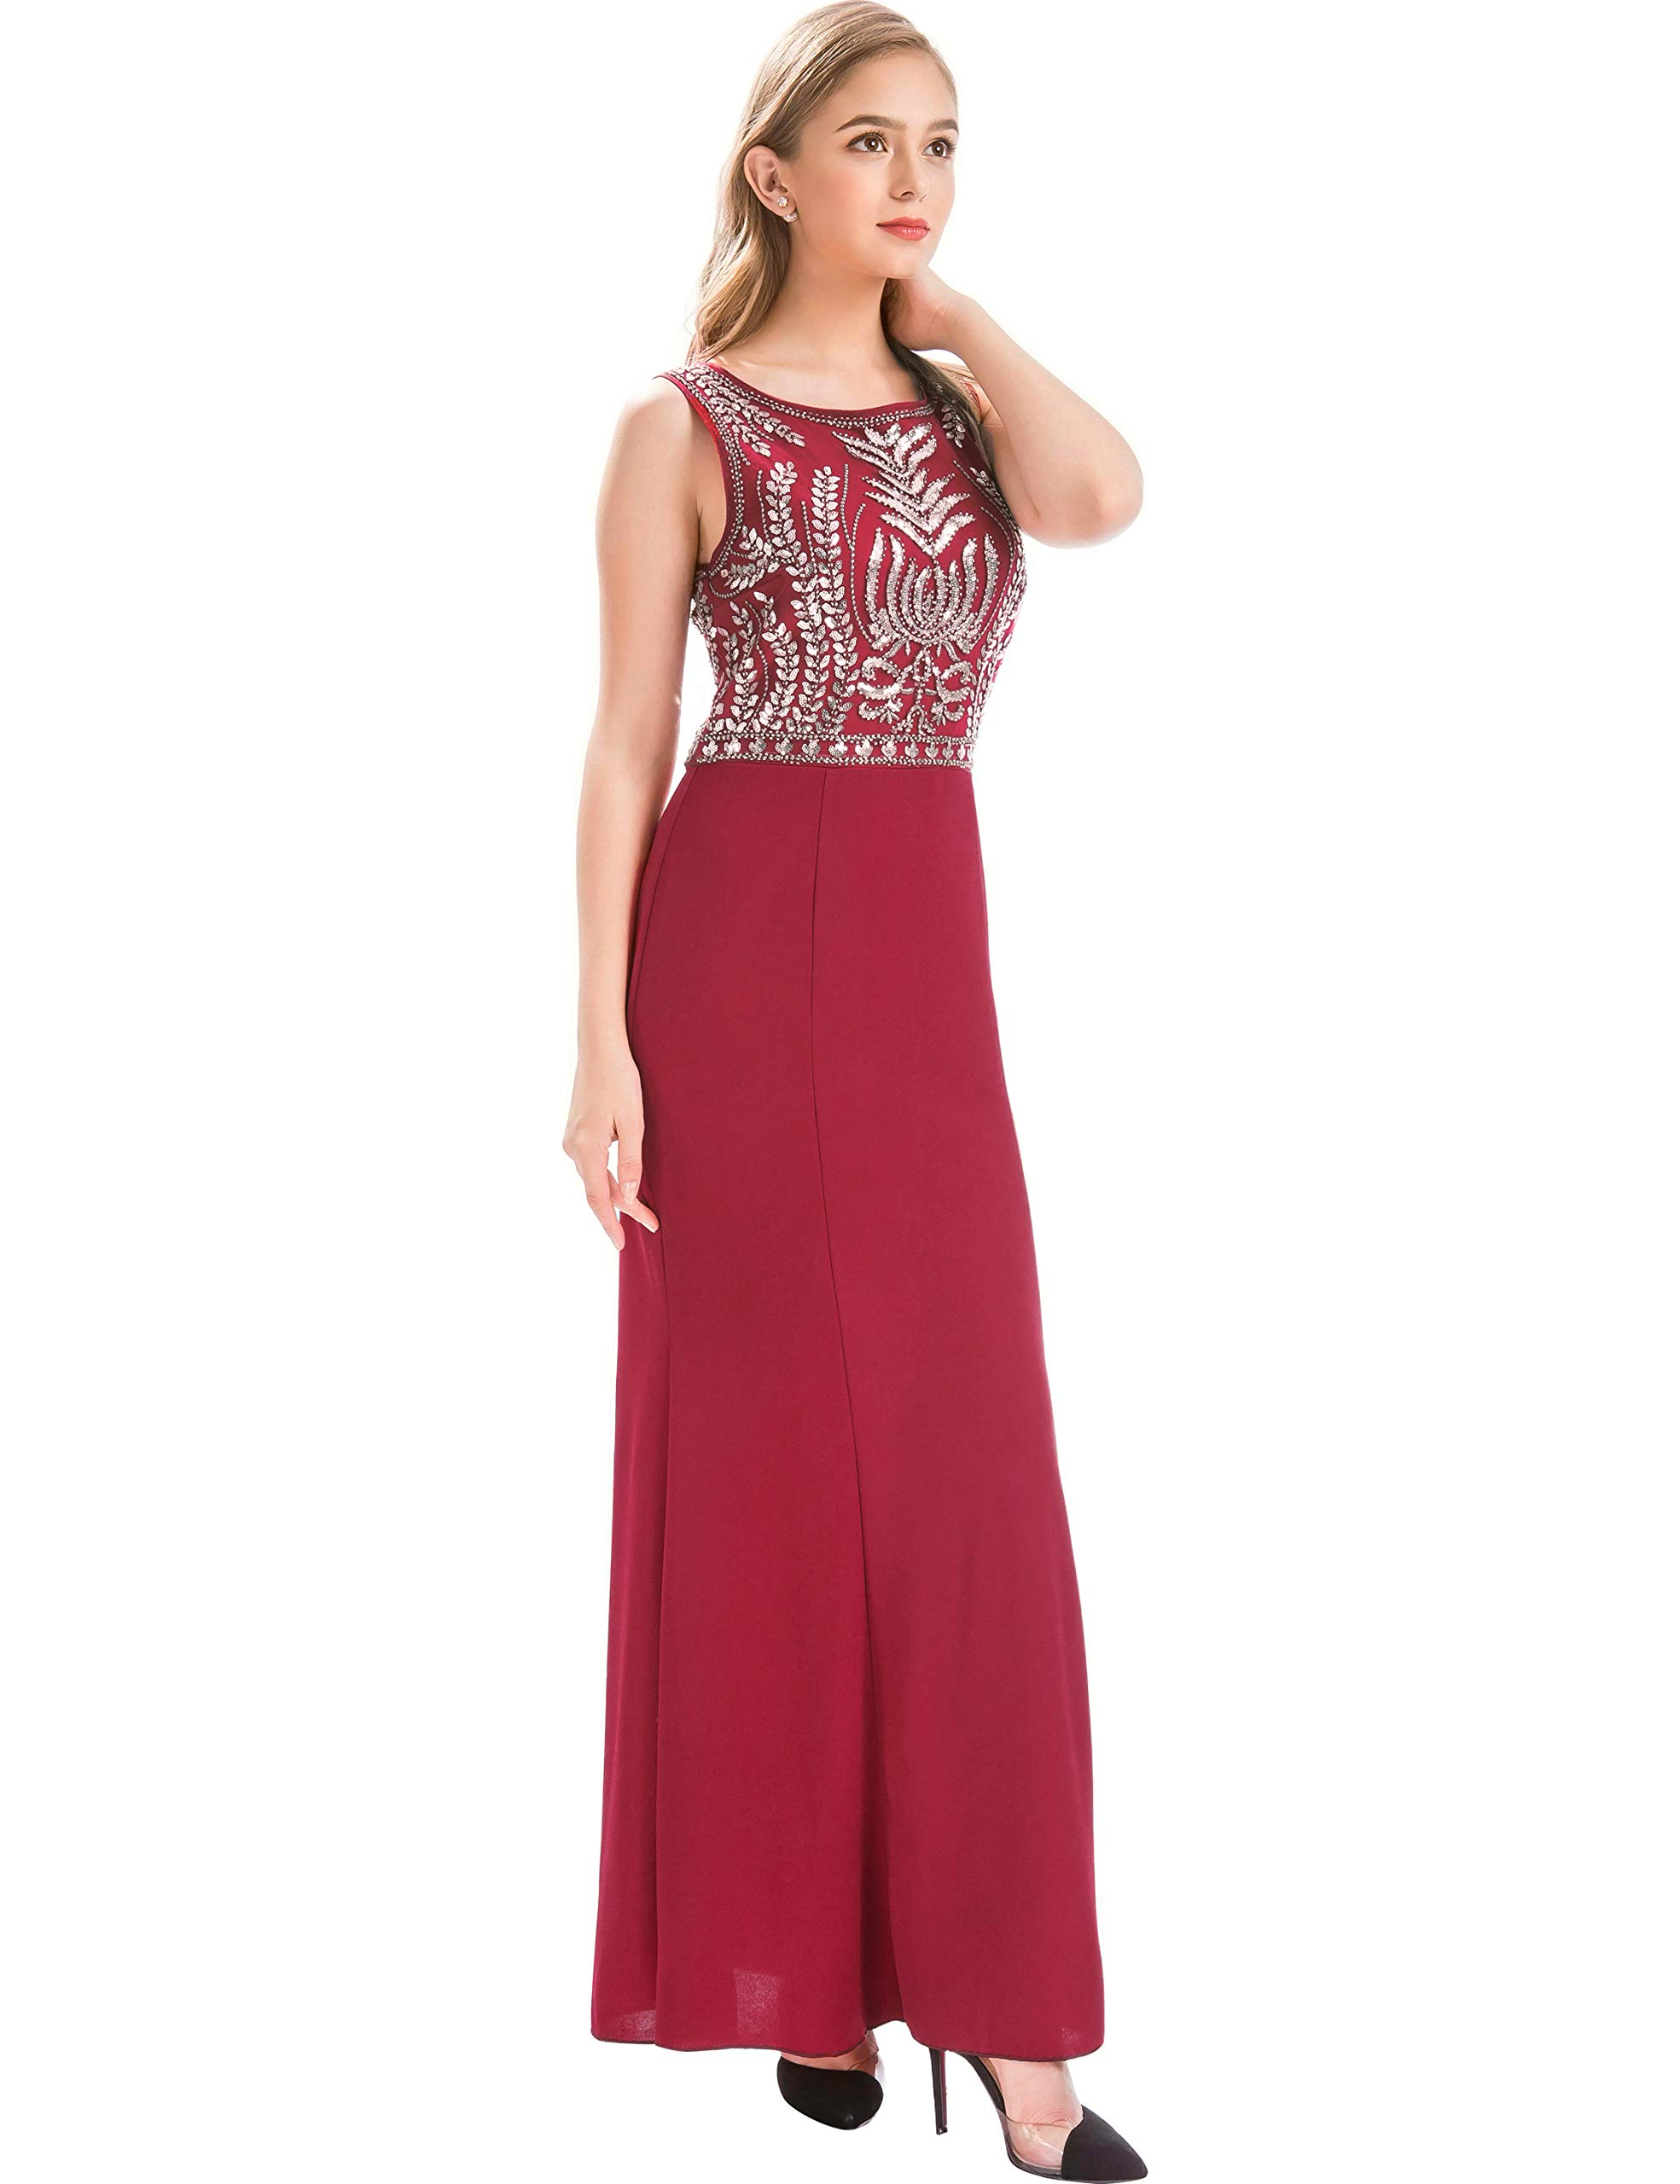 d96542631b3 Silver Glitter Long Prom Dress - Data Dynamic AG